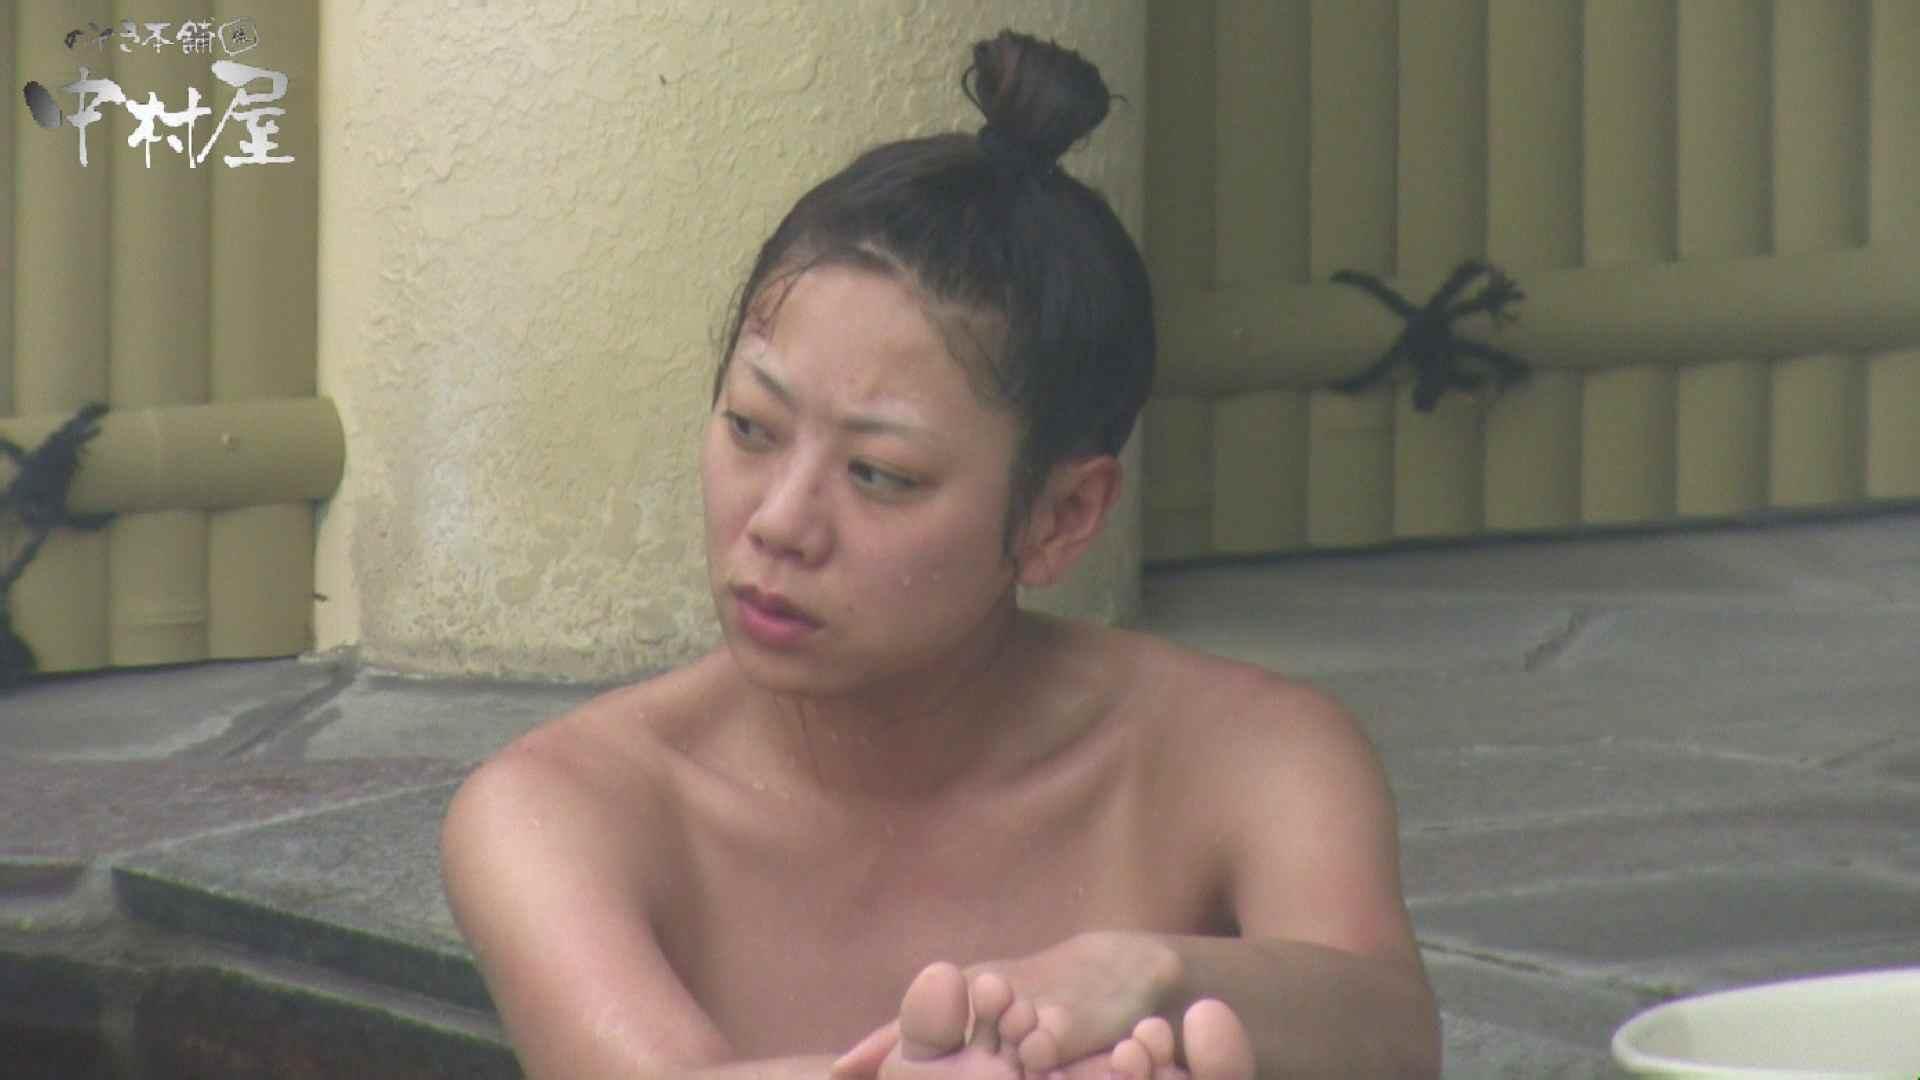 Aquaな露天風呂Vol.886 露天   HなOL  95pic 56